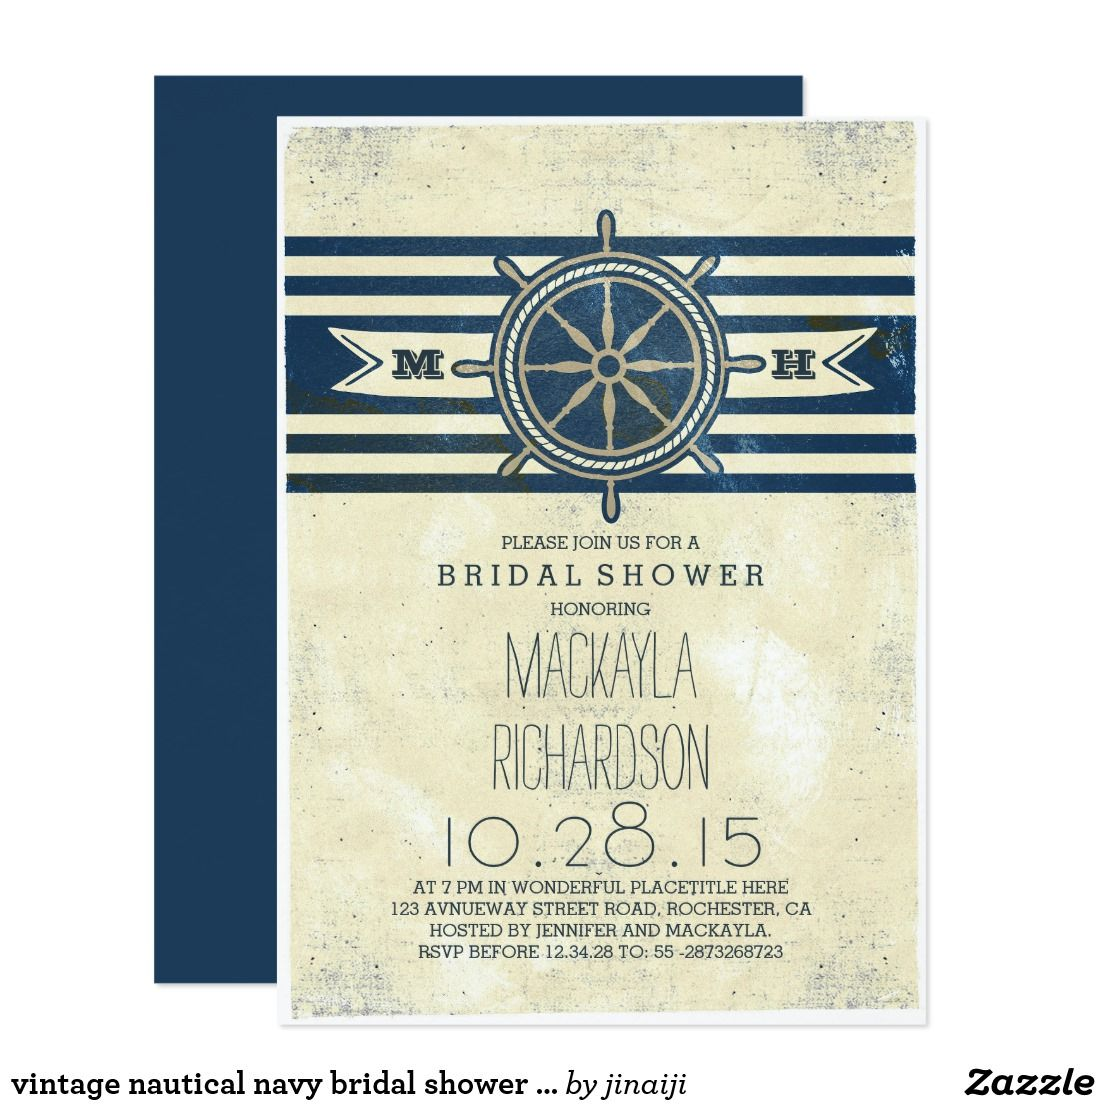 vintage nautical navy bridal shower invitation | Wedding : Nautical ...